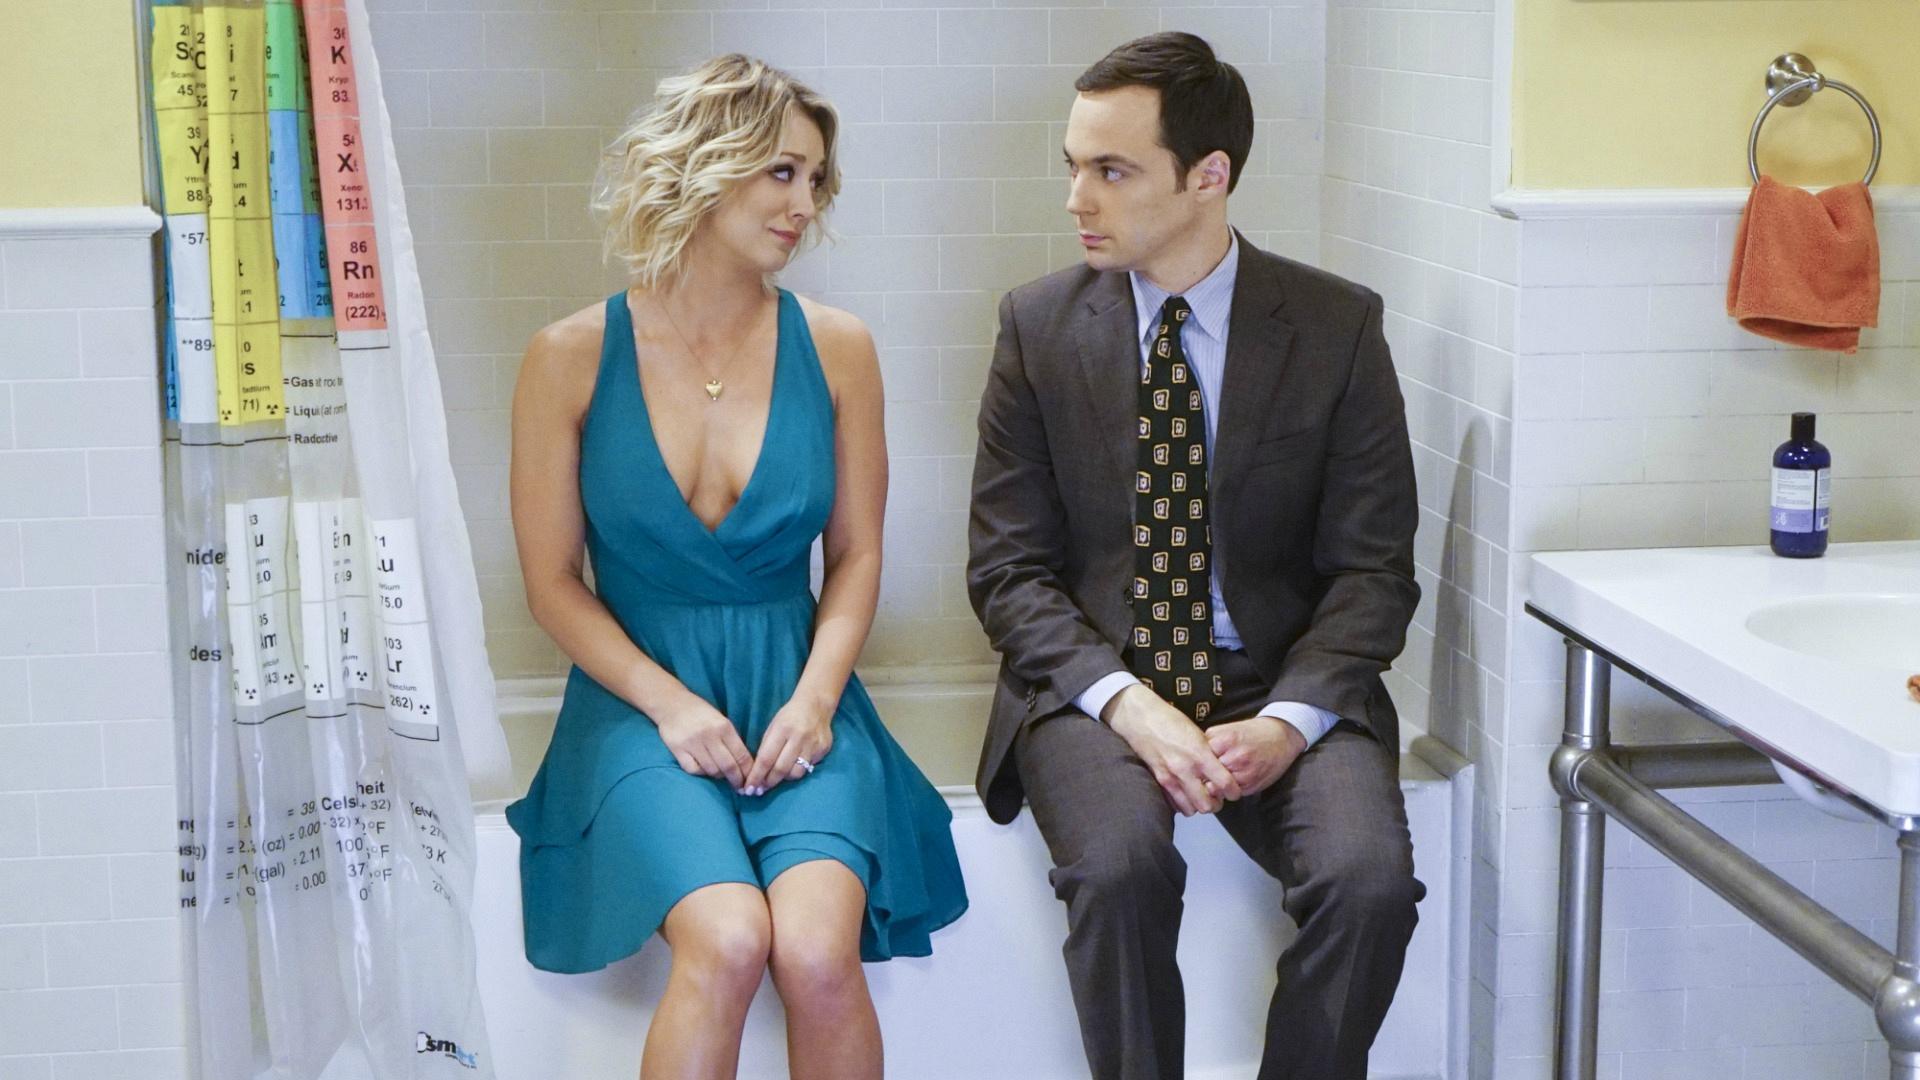 The Big Bang Theory returns for a 10th season on Monday, Sept. 19 at 8/7c.